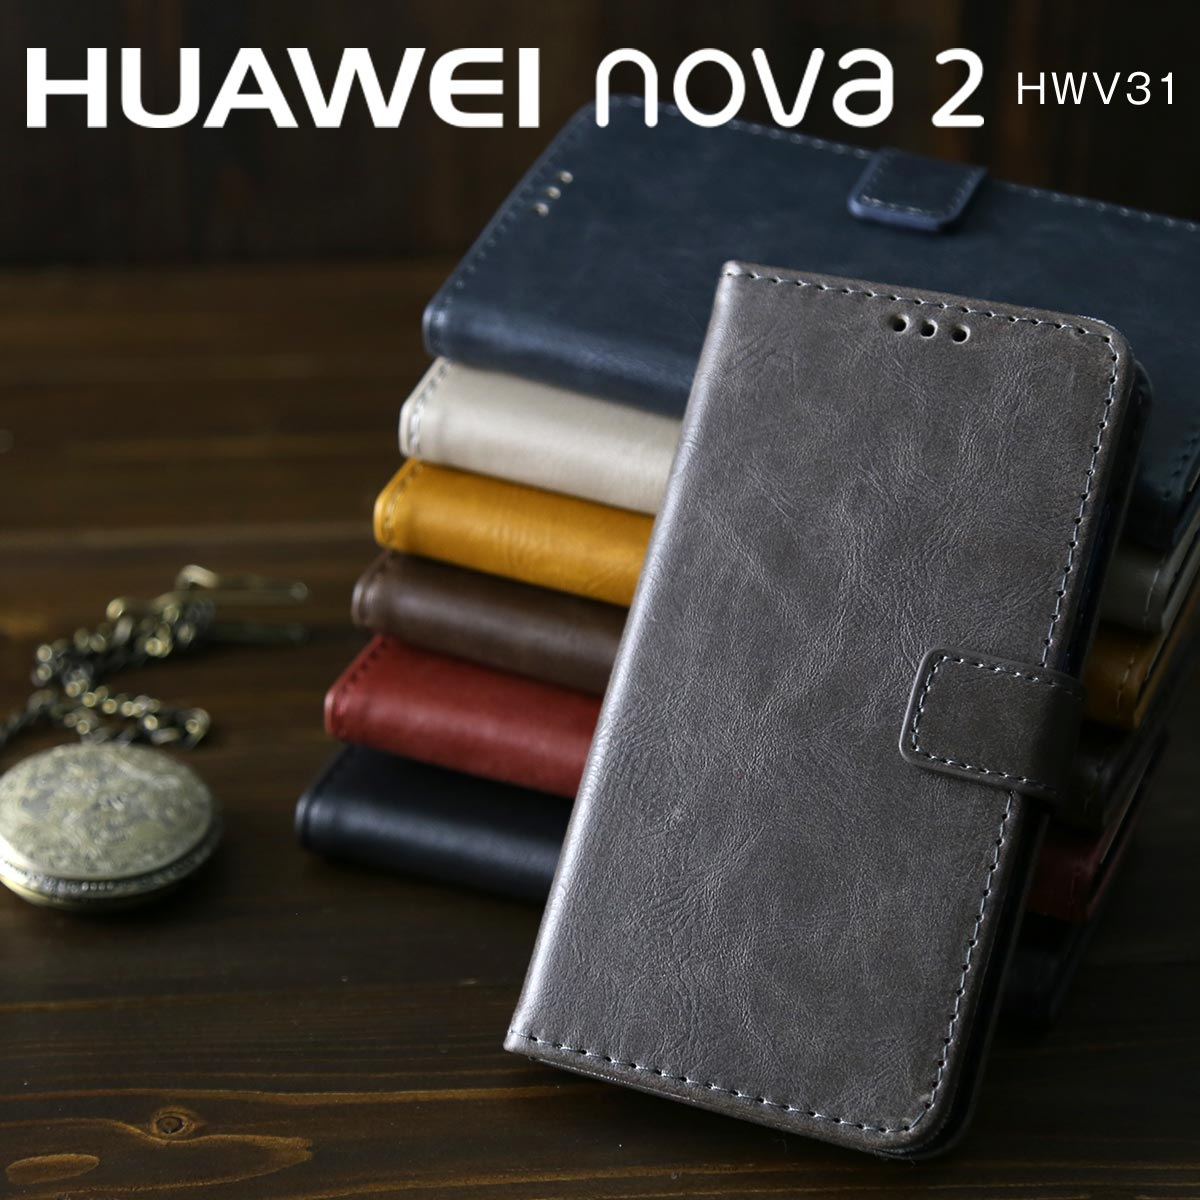 nova2 アンティークレザー手帳型ケース|かっこいい おしゃれカバー ファーウェイ カードポケット シンプル手帳ケース 手帳型 HUAWEI レザー調 レザーケース 革